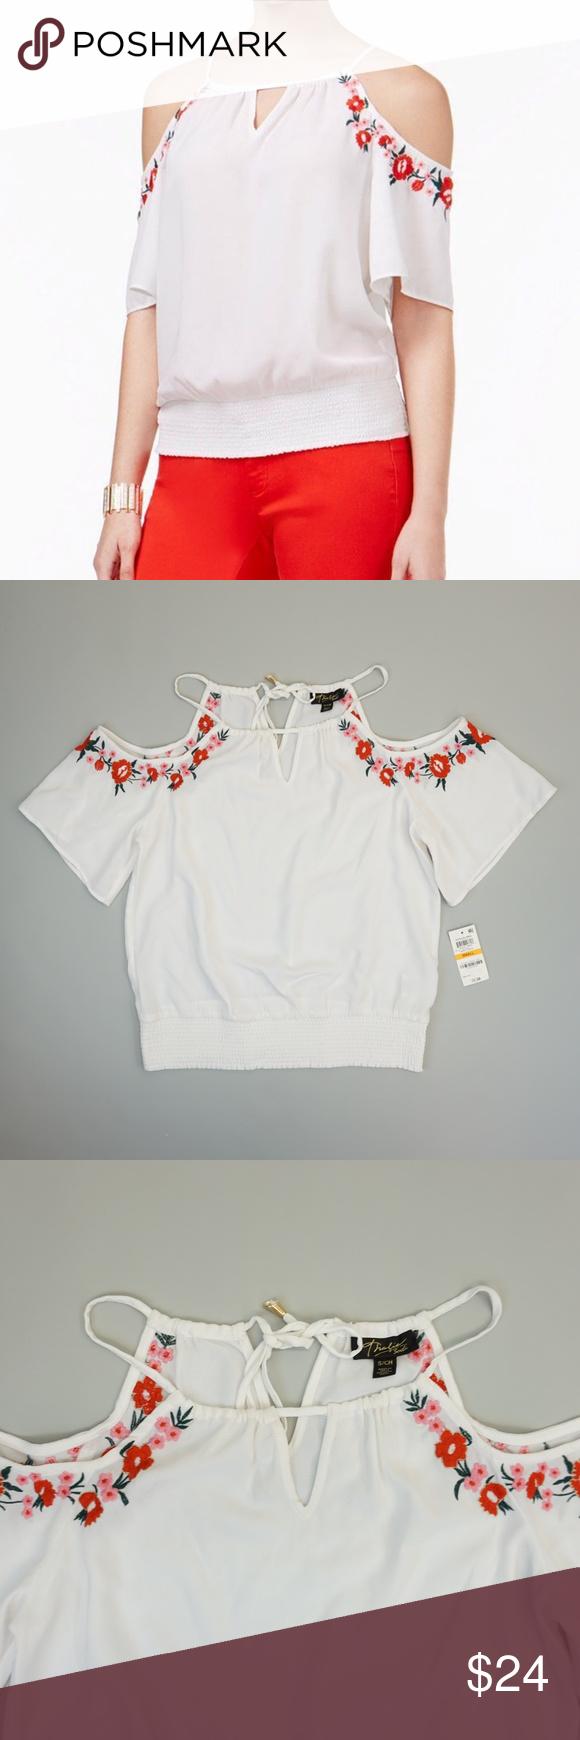 7b5854662fe6f5 Thalia Sodi Floral Embroidered Cold Shoulder Top S Thalia Sodi Womens Top  Floral Embroidered Cold Shoulder Keyhole Scoop Neck Blouse Shirt SIZE  S  COLOR  ...